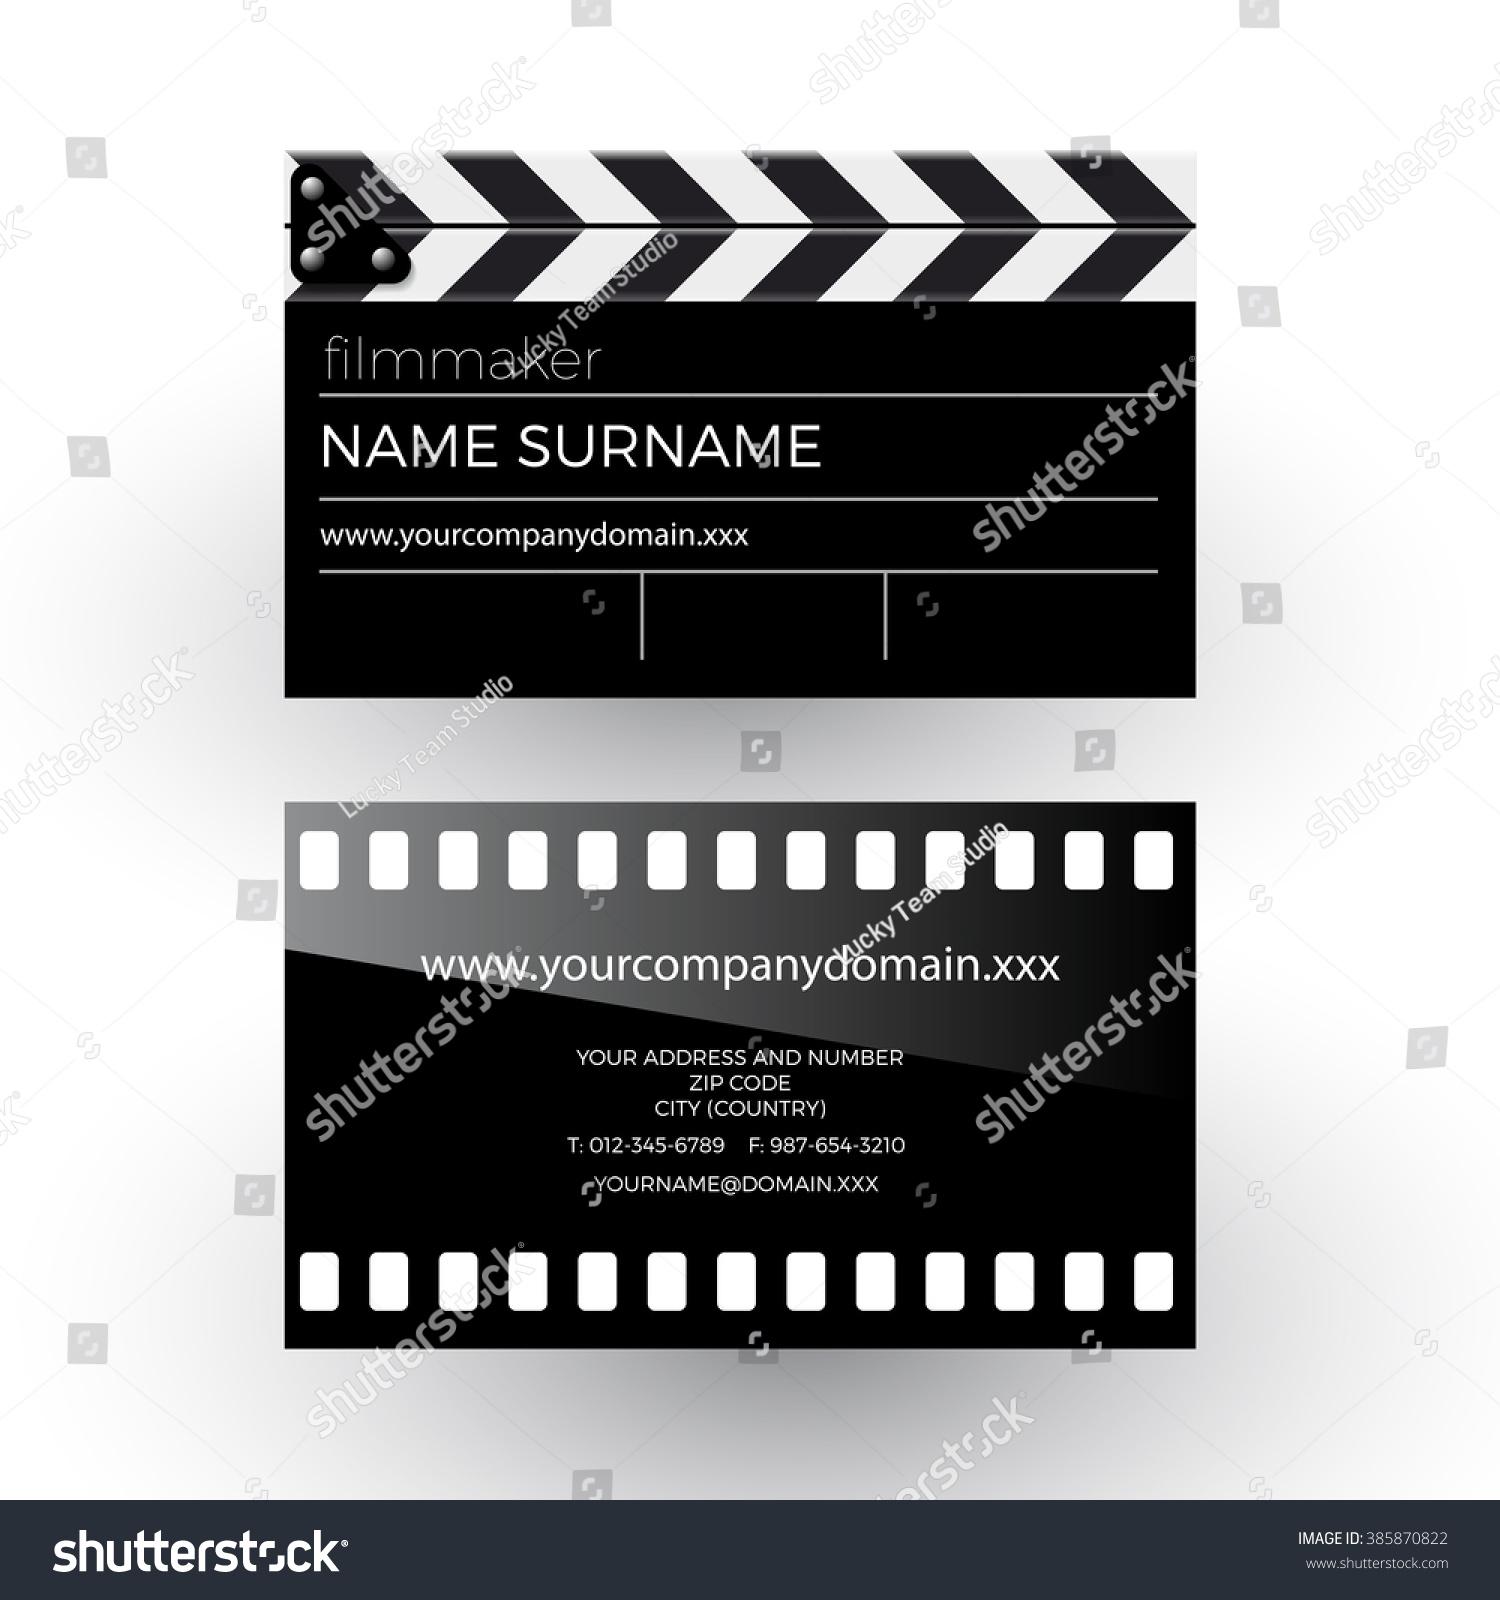 Vector Abstract Clapperboard Movie Film Filmmaker Stock Vector ...